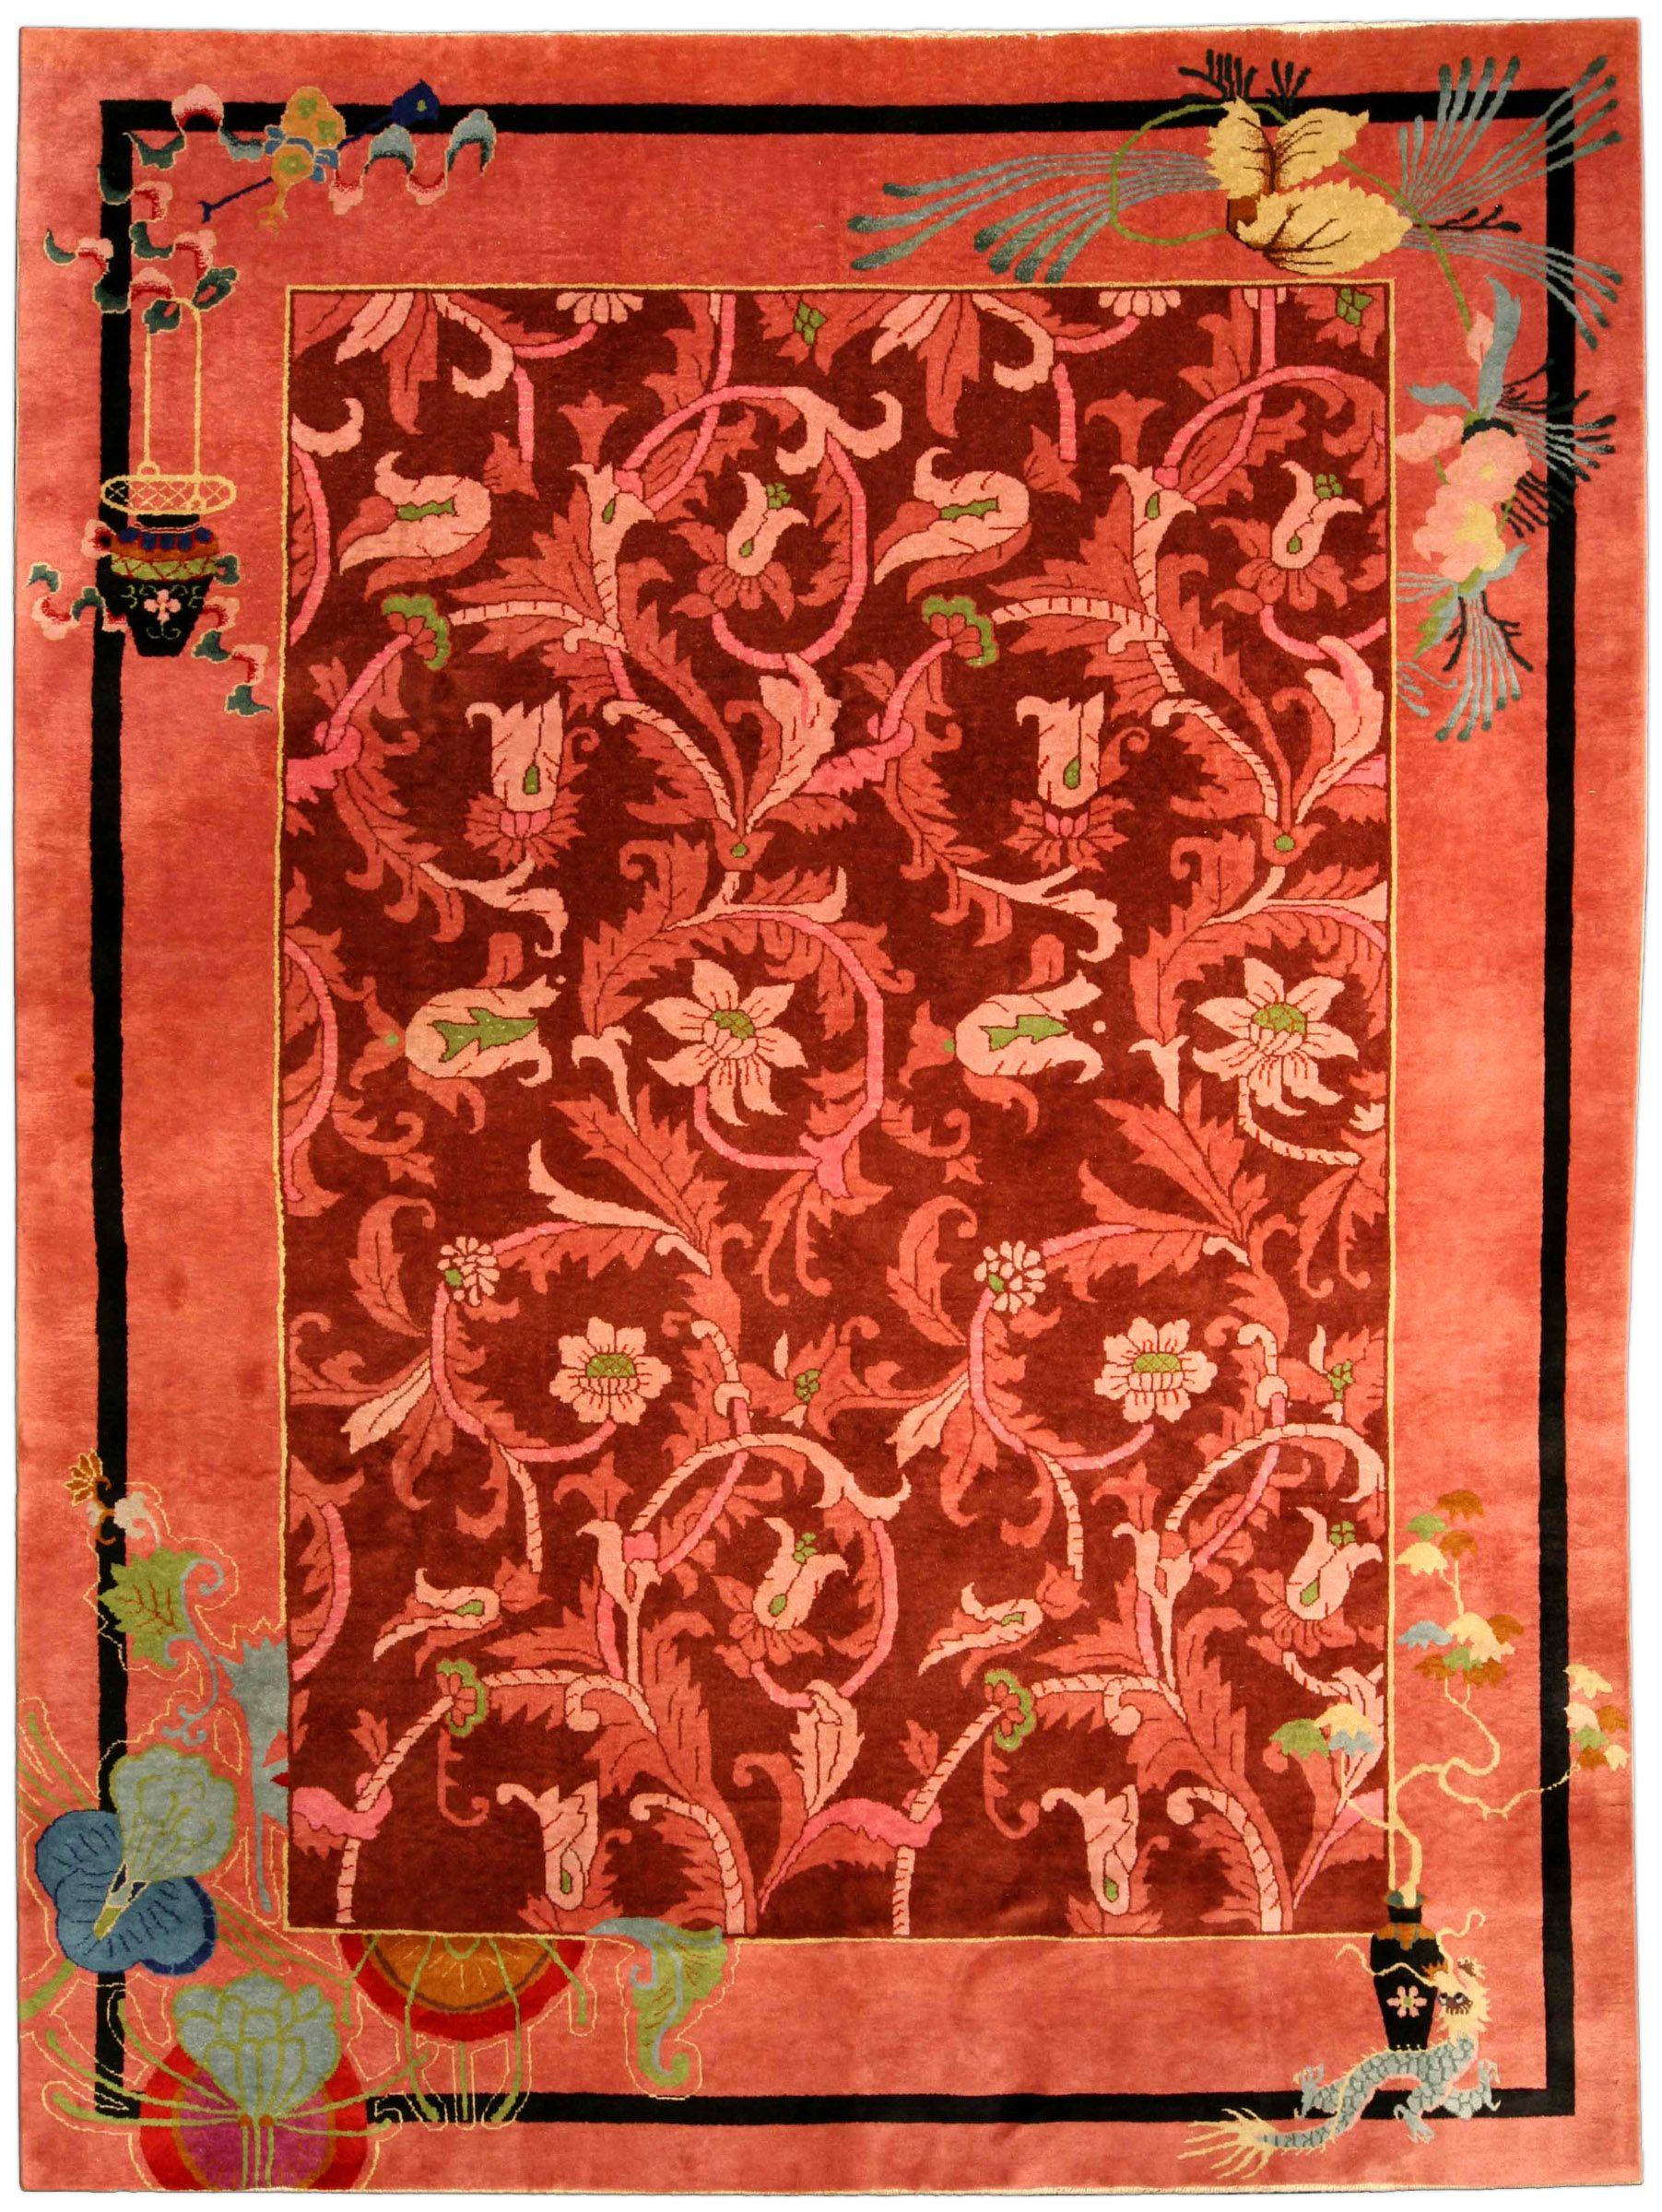 Vintage chinese art deco carpet chinese art art deco and room rugs a chinese art deco carpet bb4169 by doris leslie blau a whimsical second quarter dhlflorist Choice Image